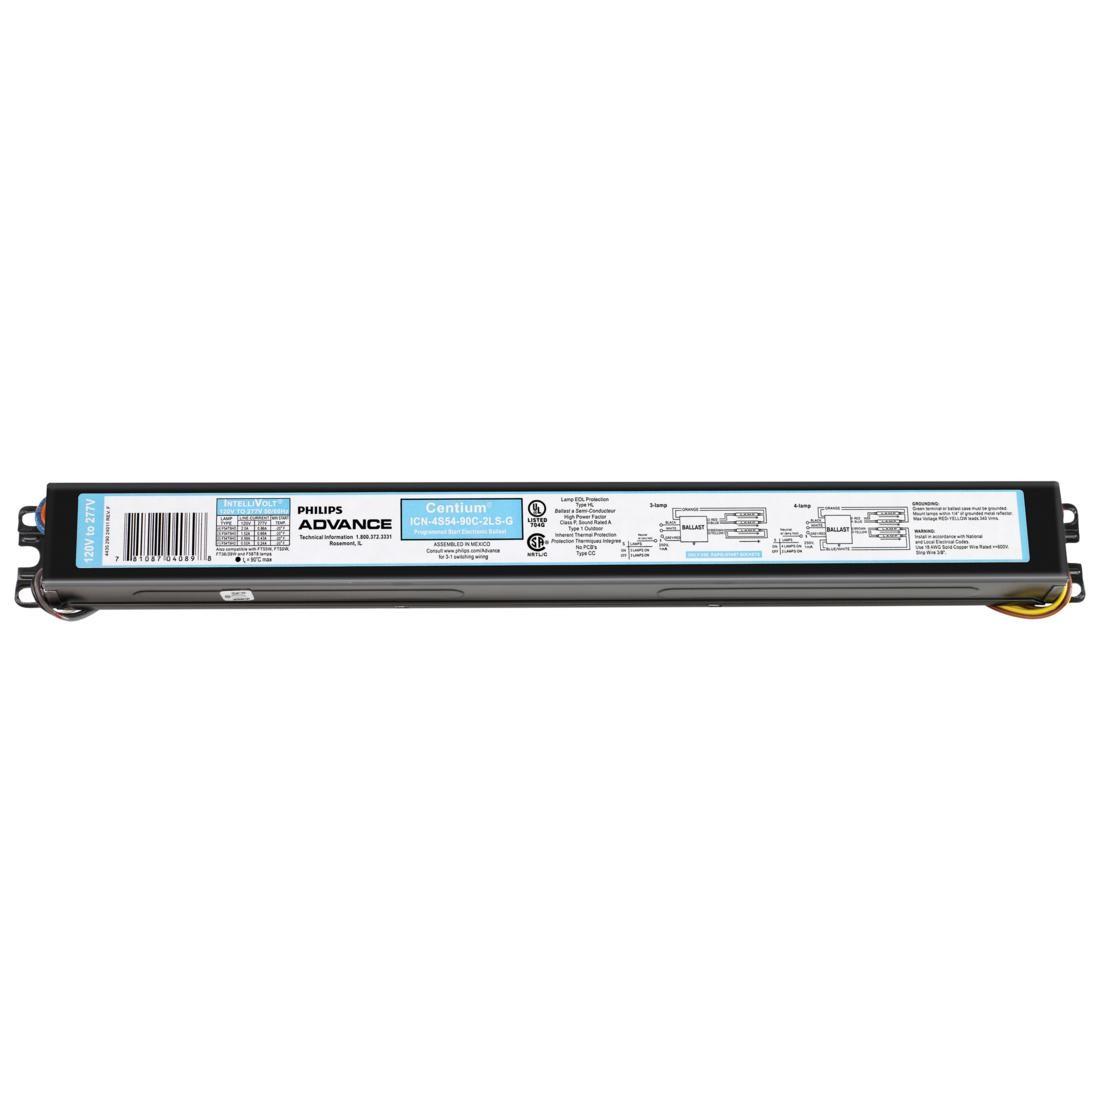 bodine b50 fluorescent emergency ballast wiring diagram trane heat pump diagrams battery pack outdoor